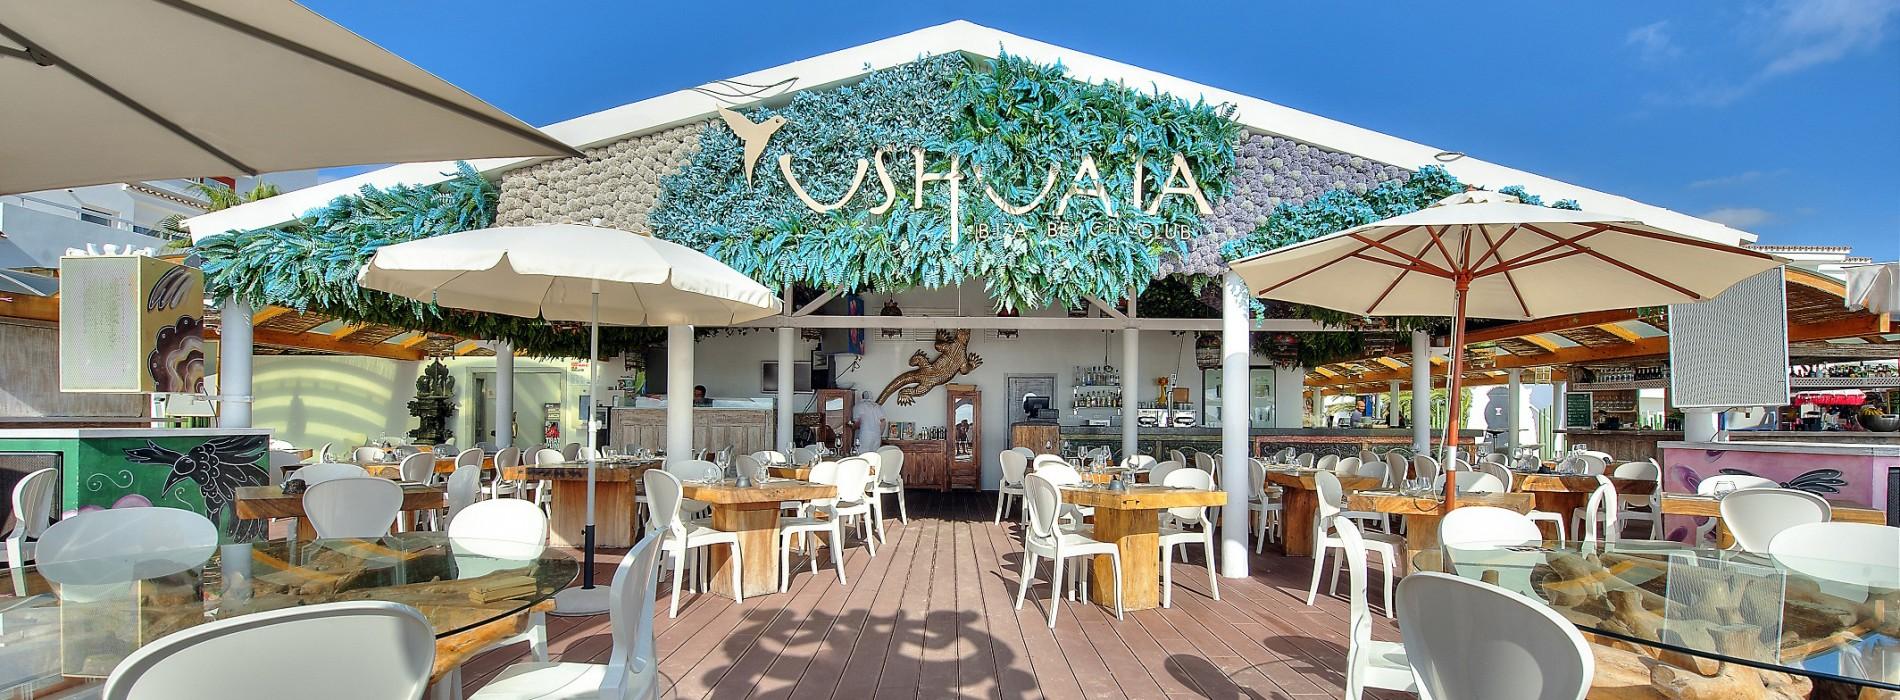 Ushuaïa Ibiza Beach Hotel unveils new website